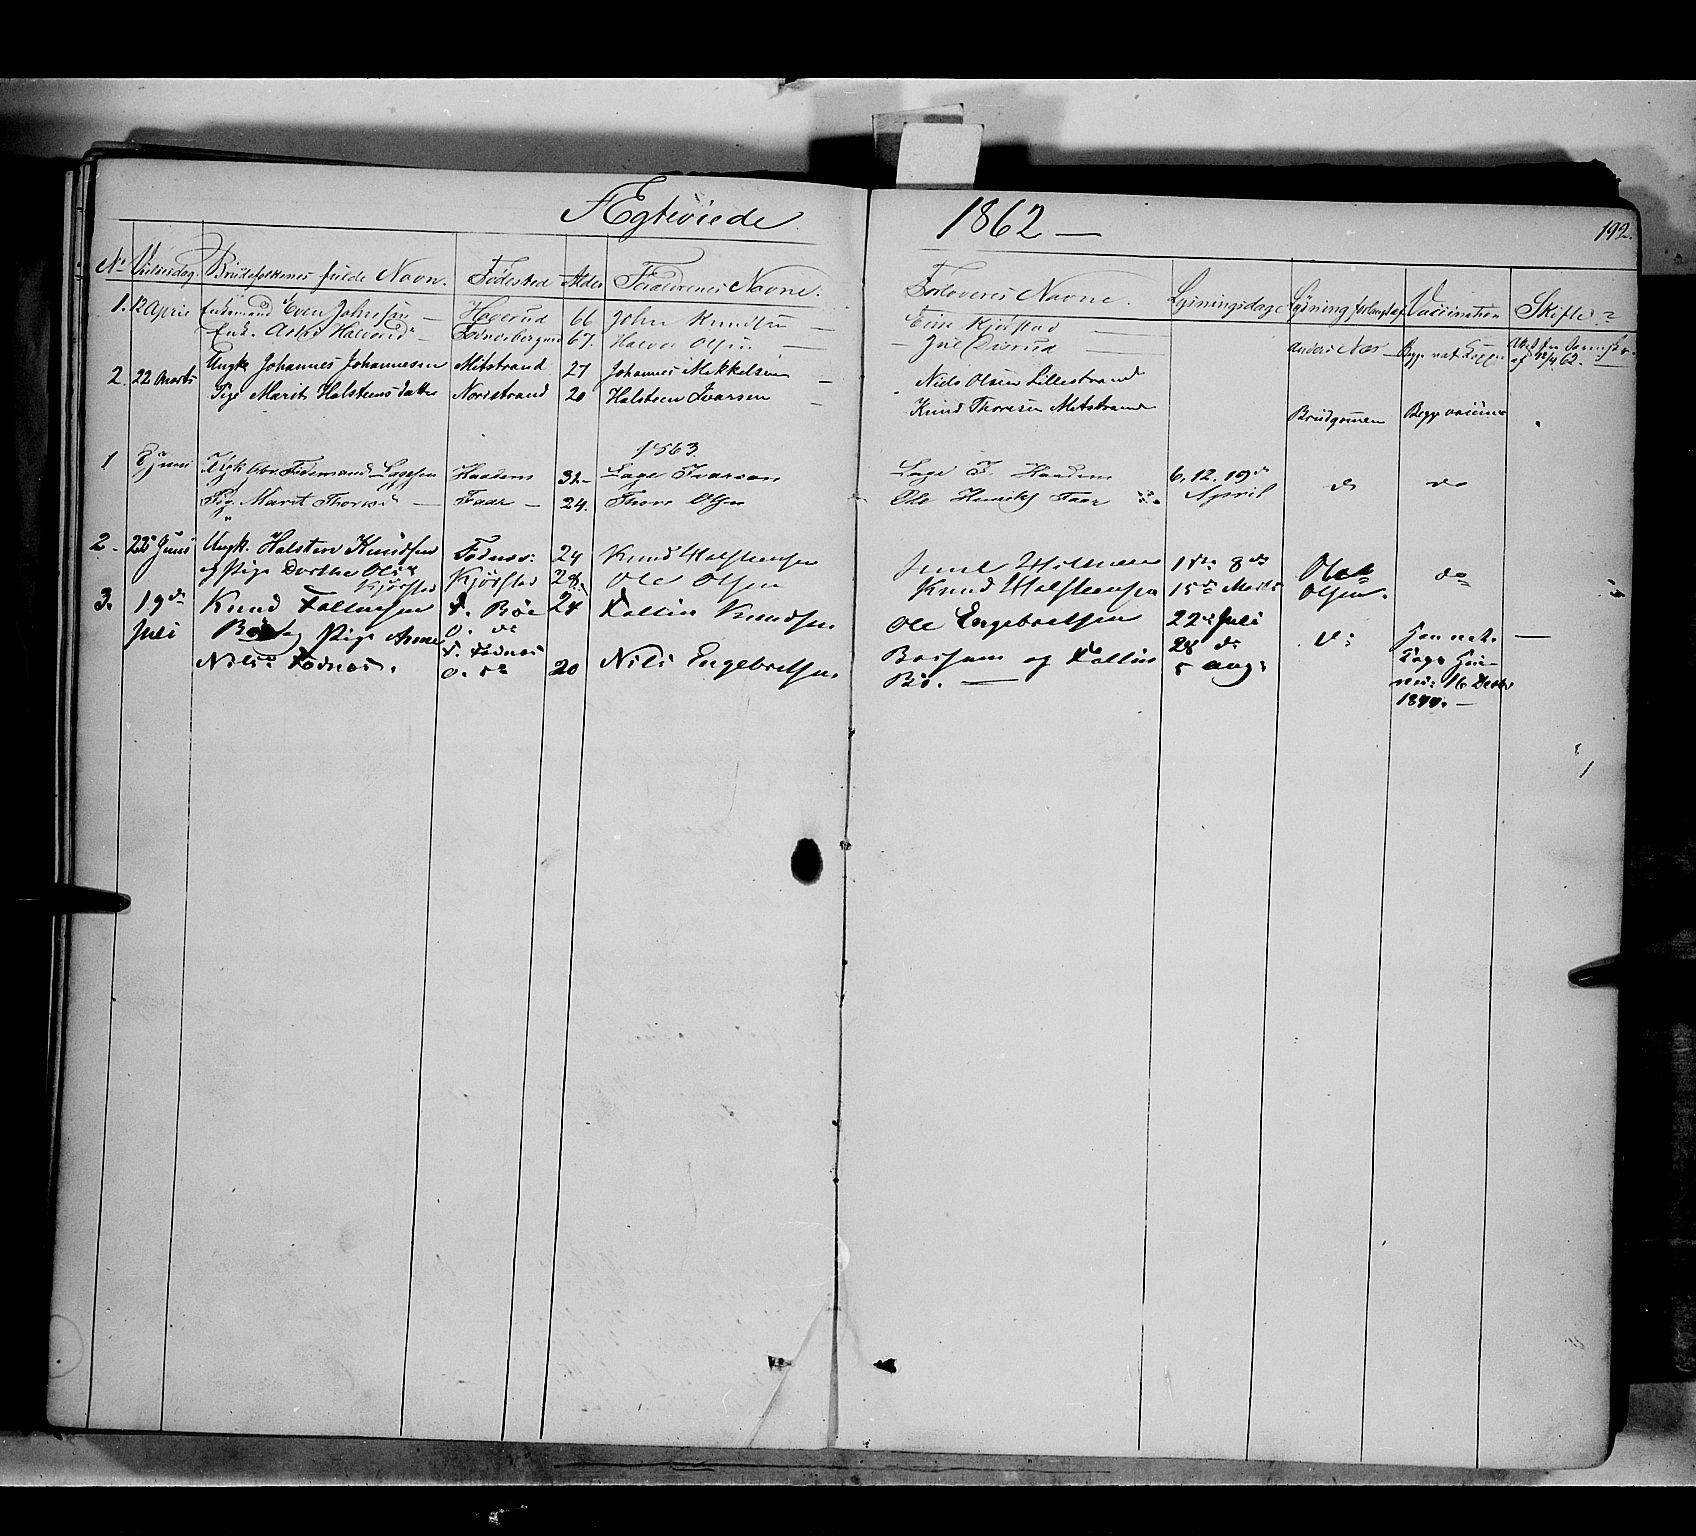 SAH, Nord-Aurdal prestekontor, Ministerialbok nr. 5, 1842-1863, s. 192